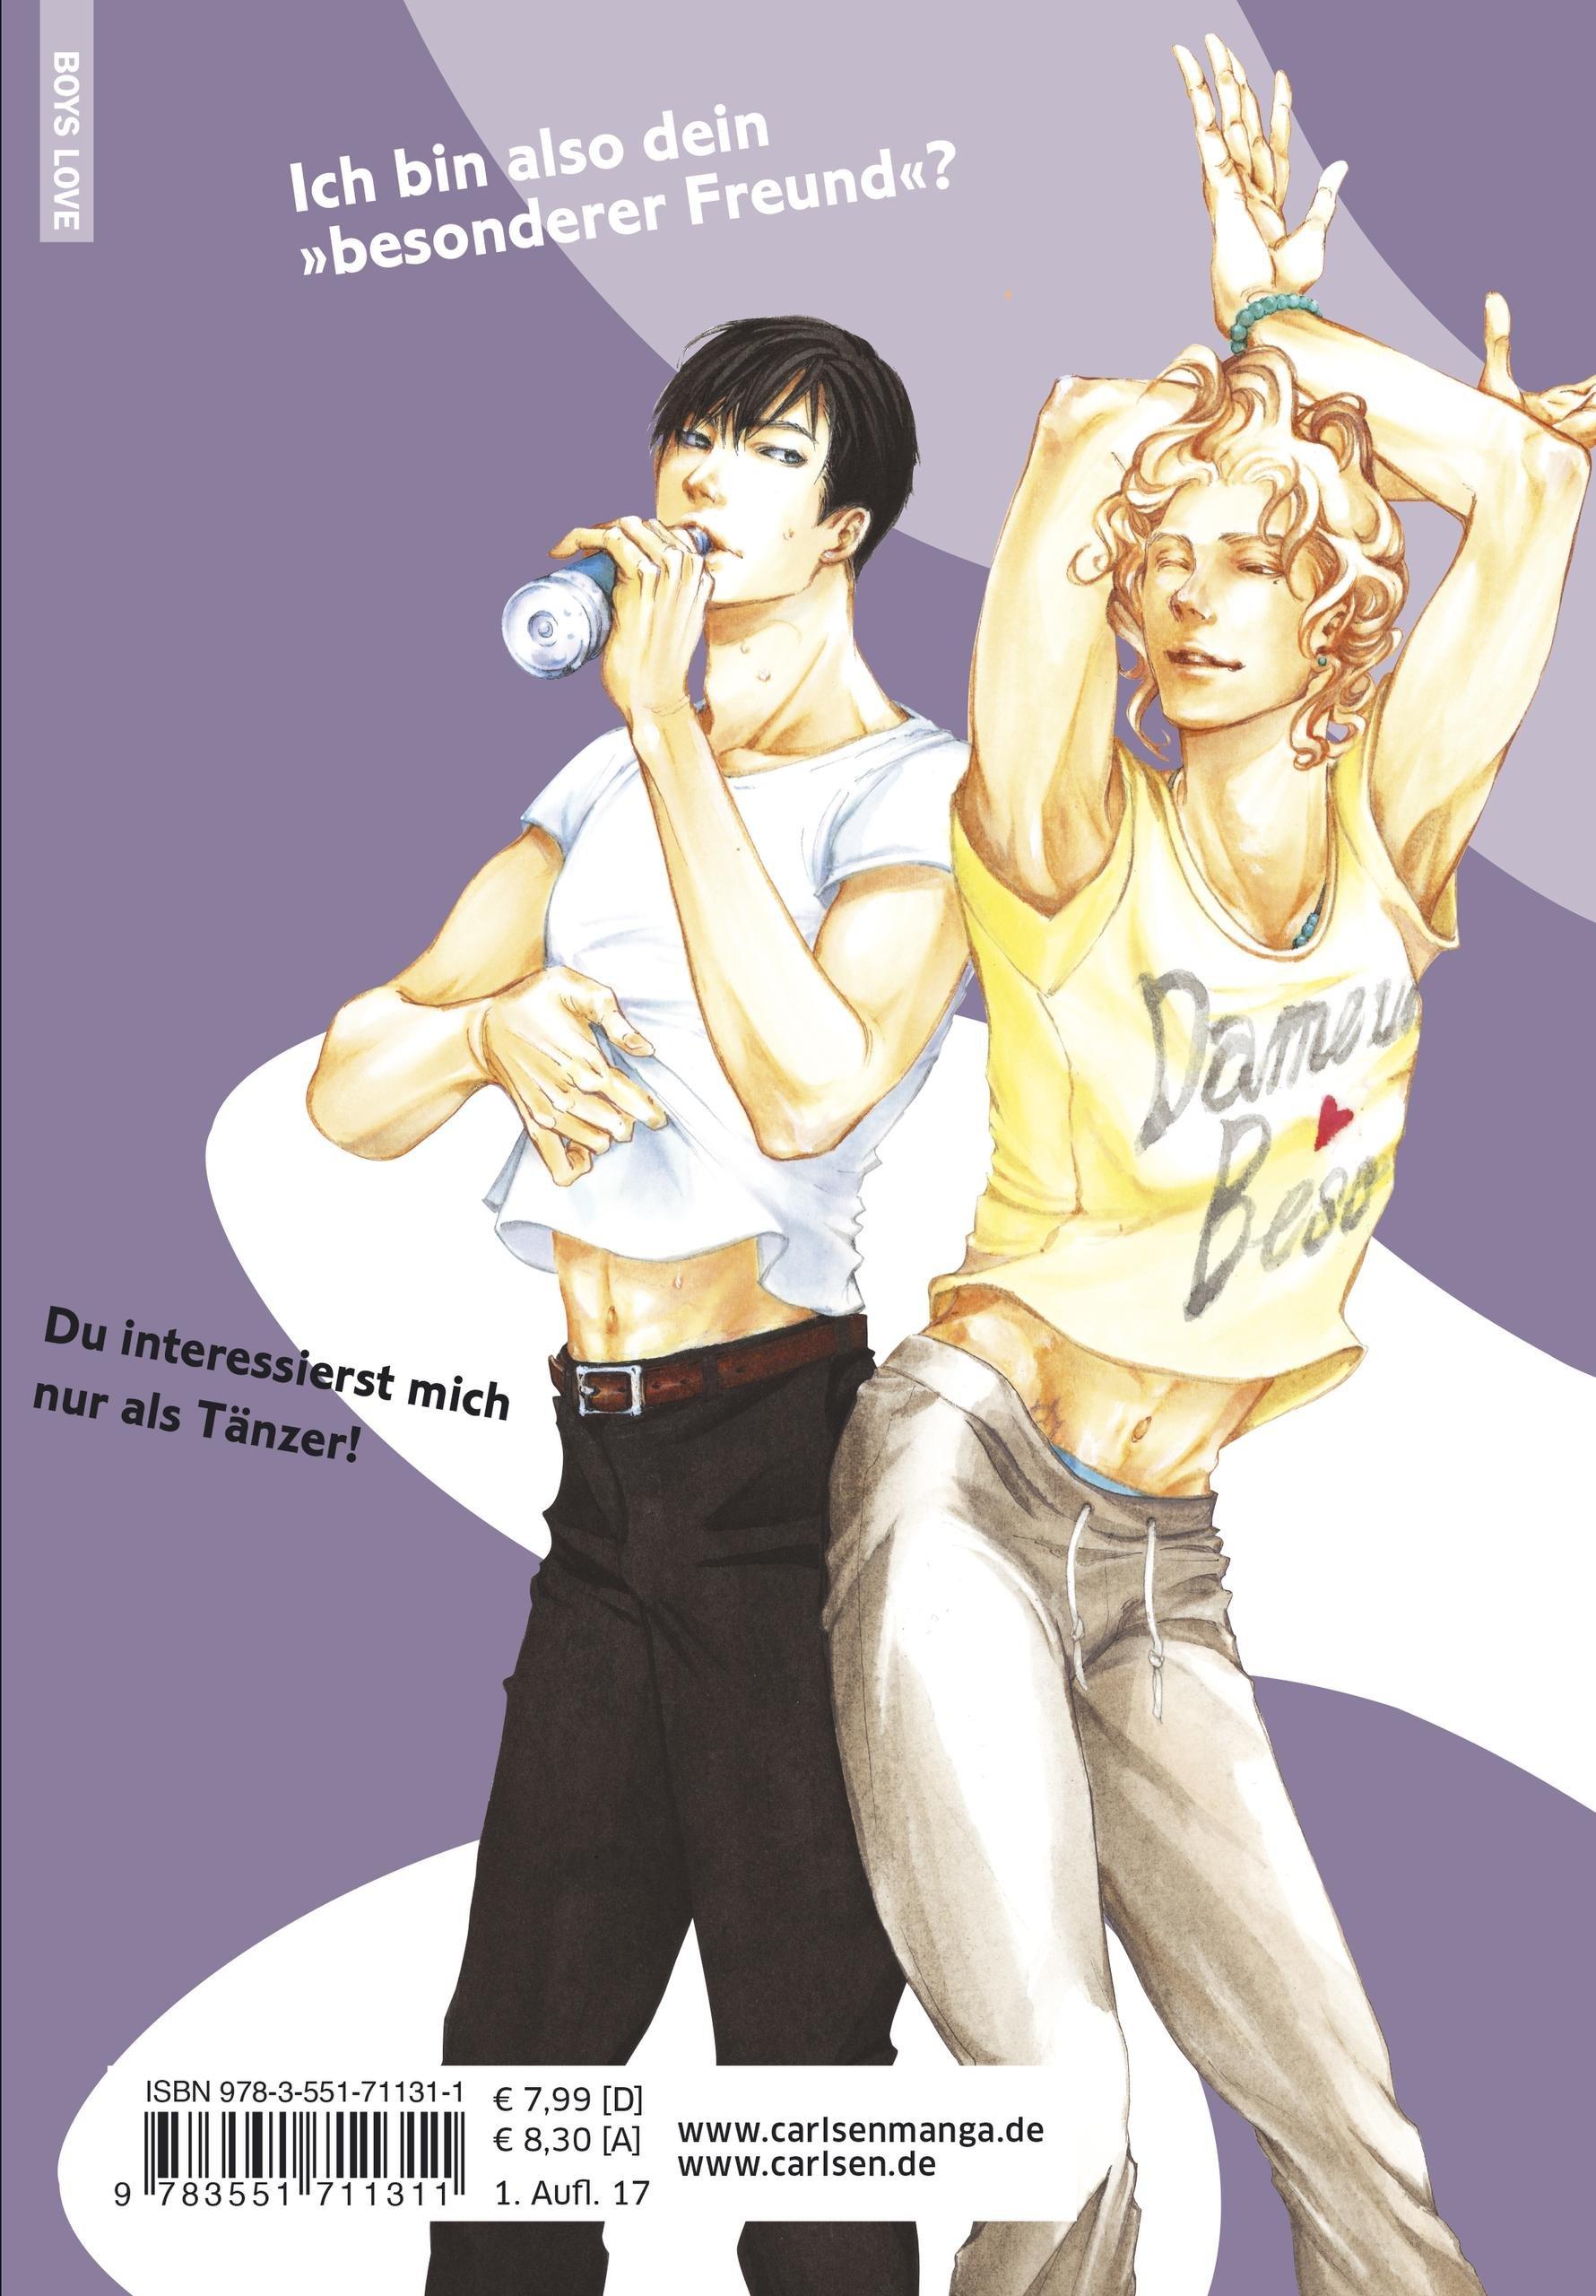 10 Dance! 2: Amazon.de: Satoh Inoue, Dorothea Überall: Bücher